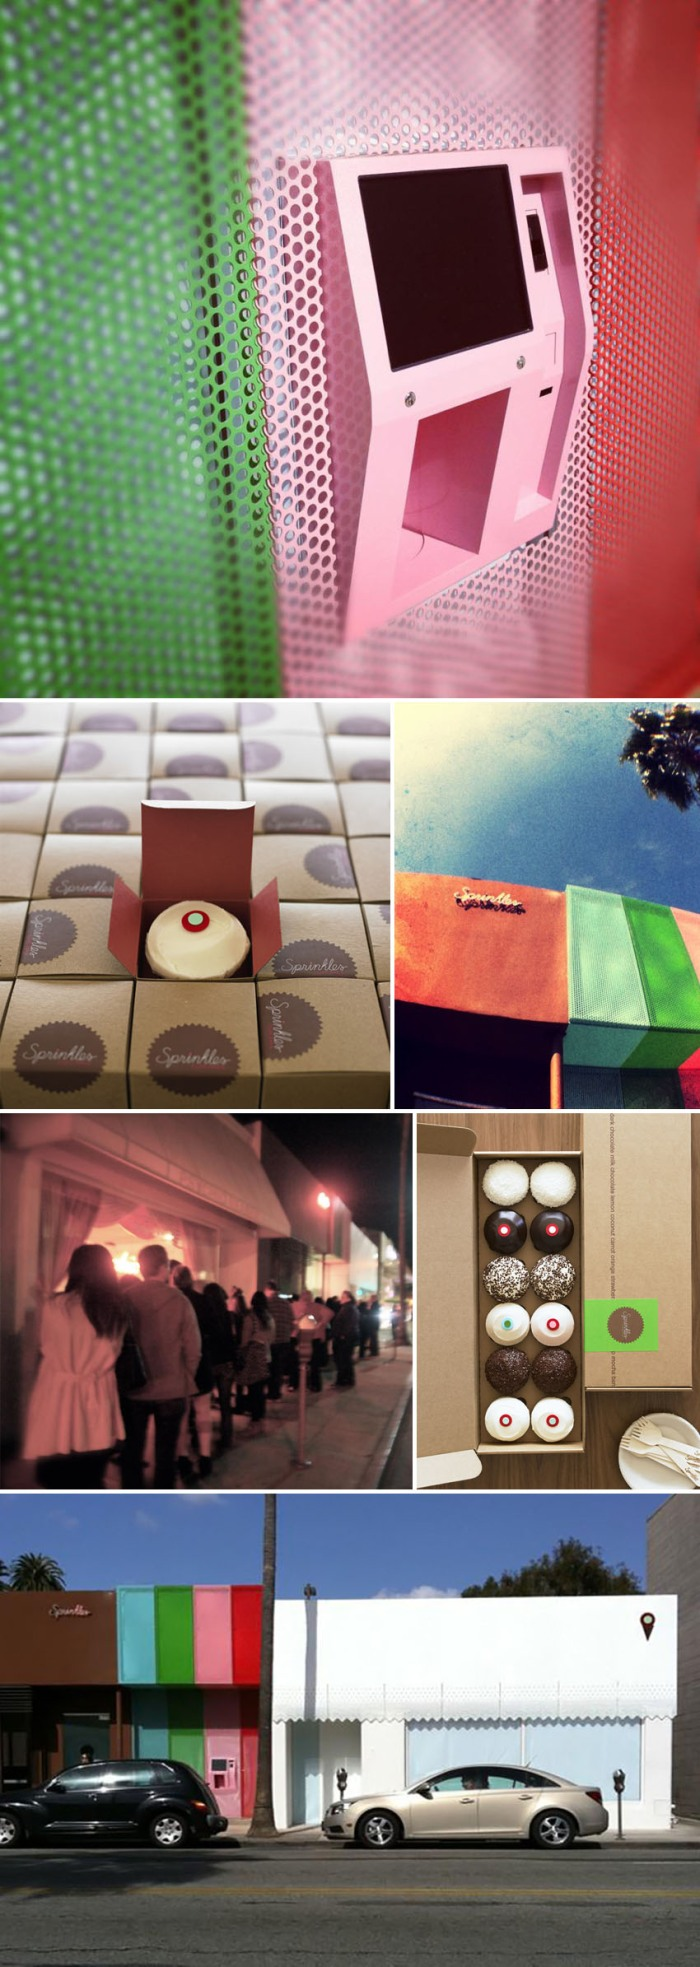 cool vending machine, 24-hour cupcake atm, Sprinkles cupcakes, food, dessert, collabcubed